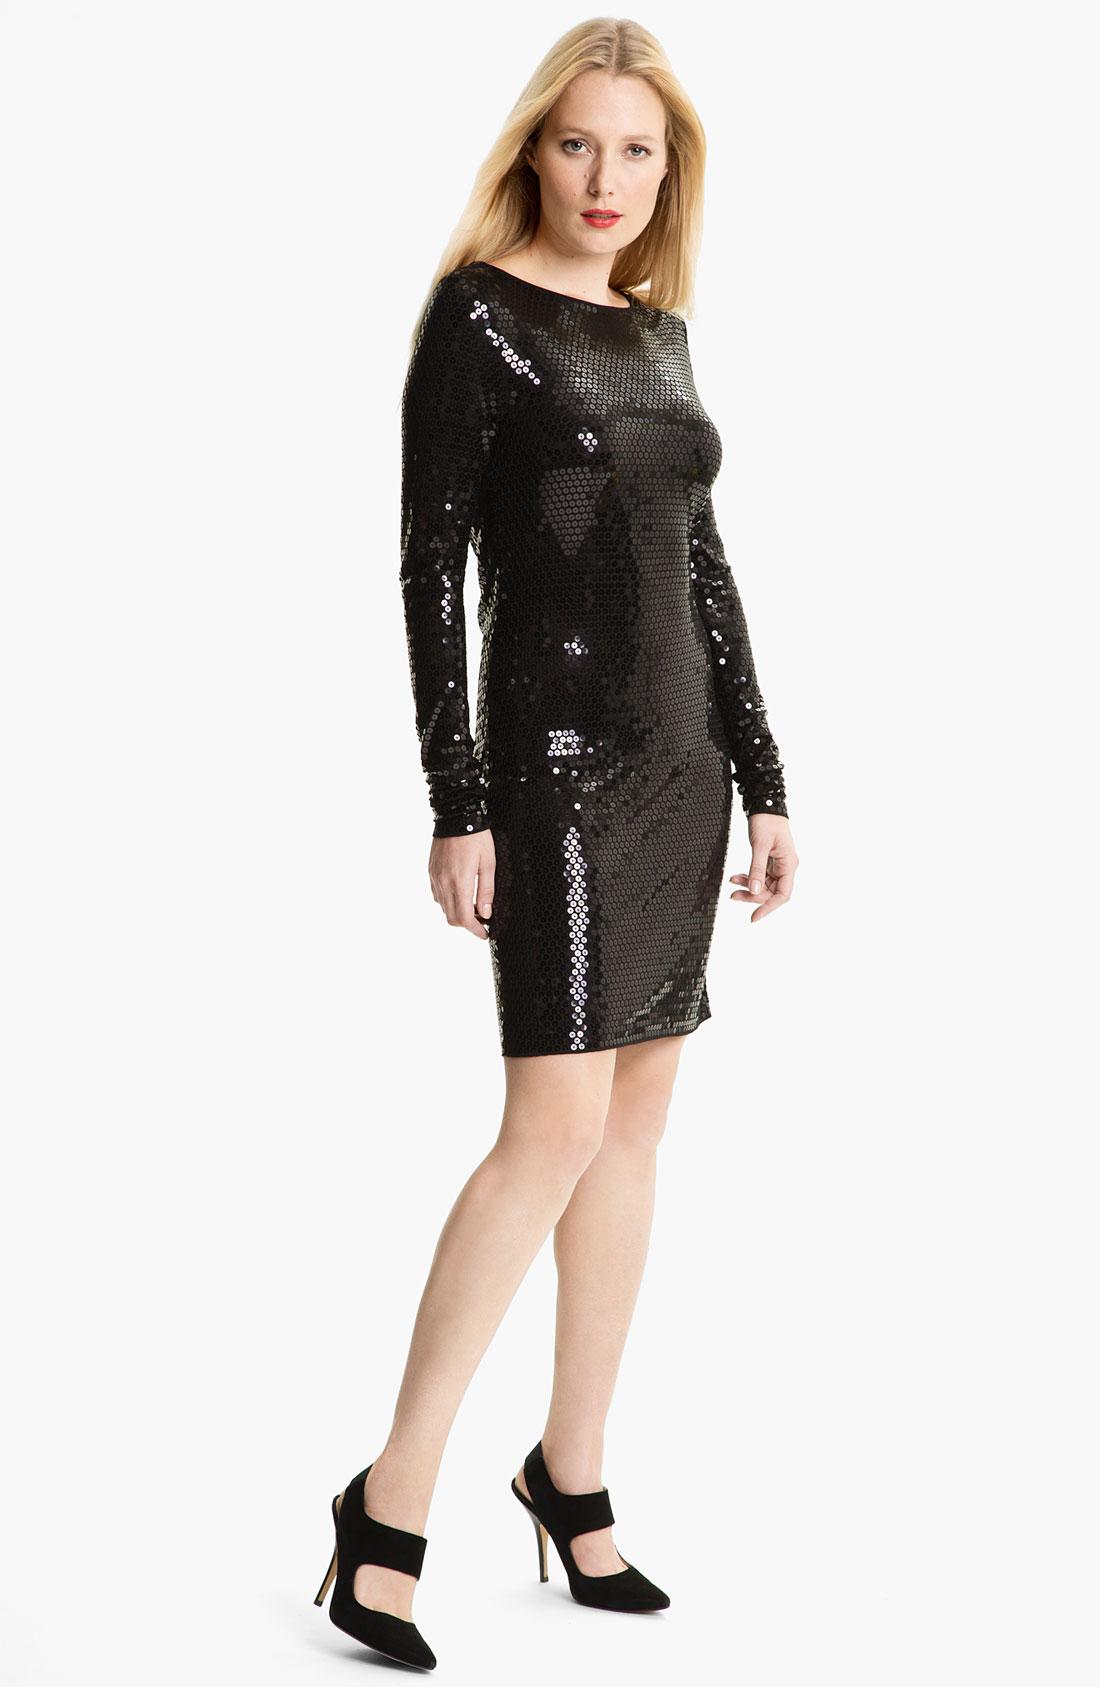 michael kors black sequin dress